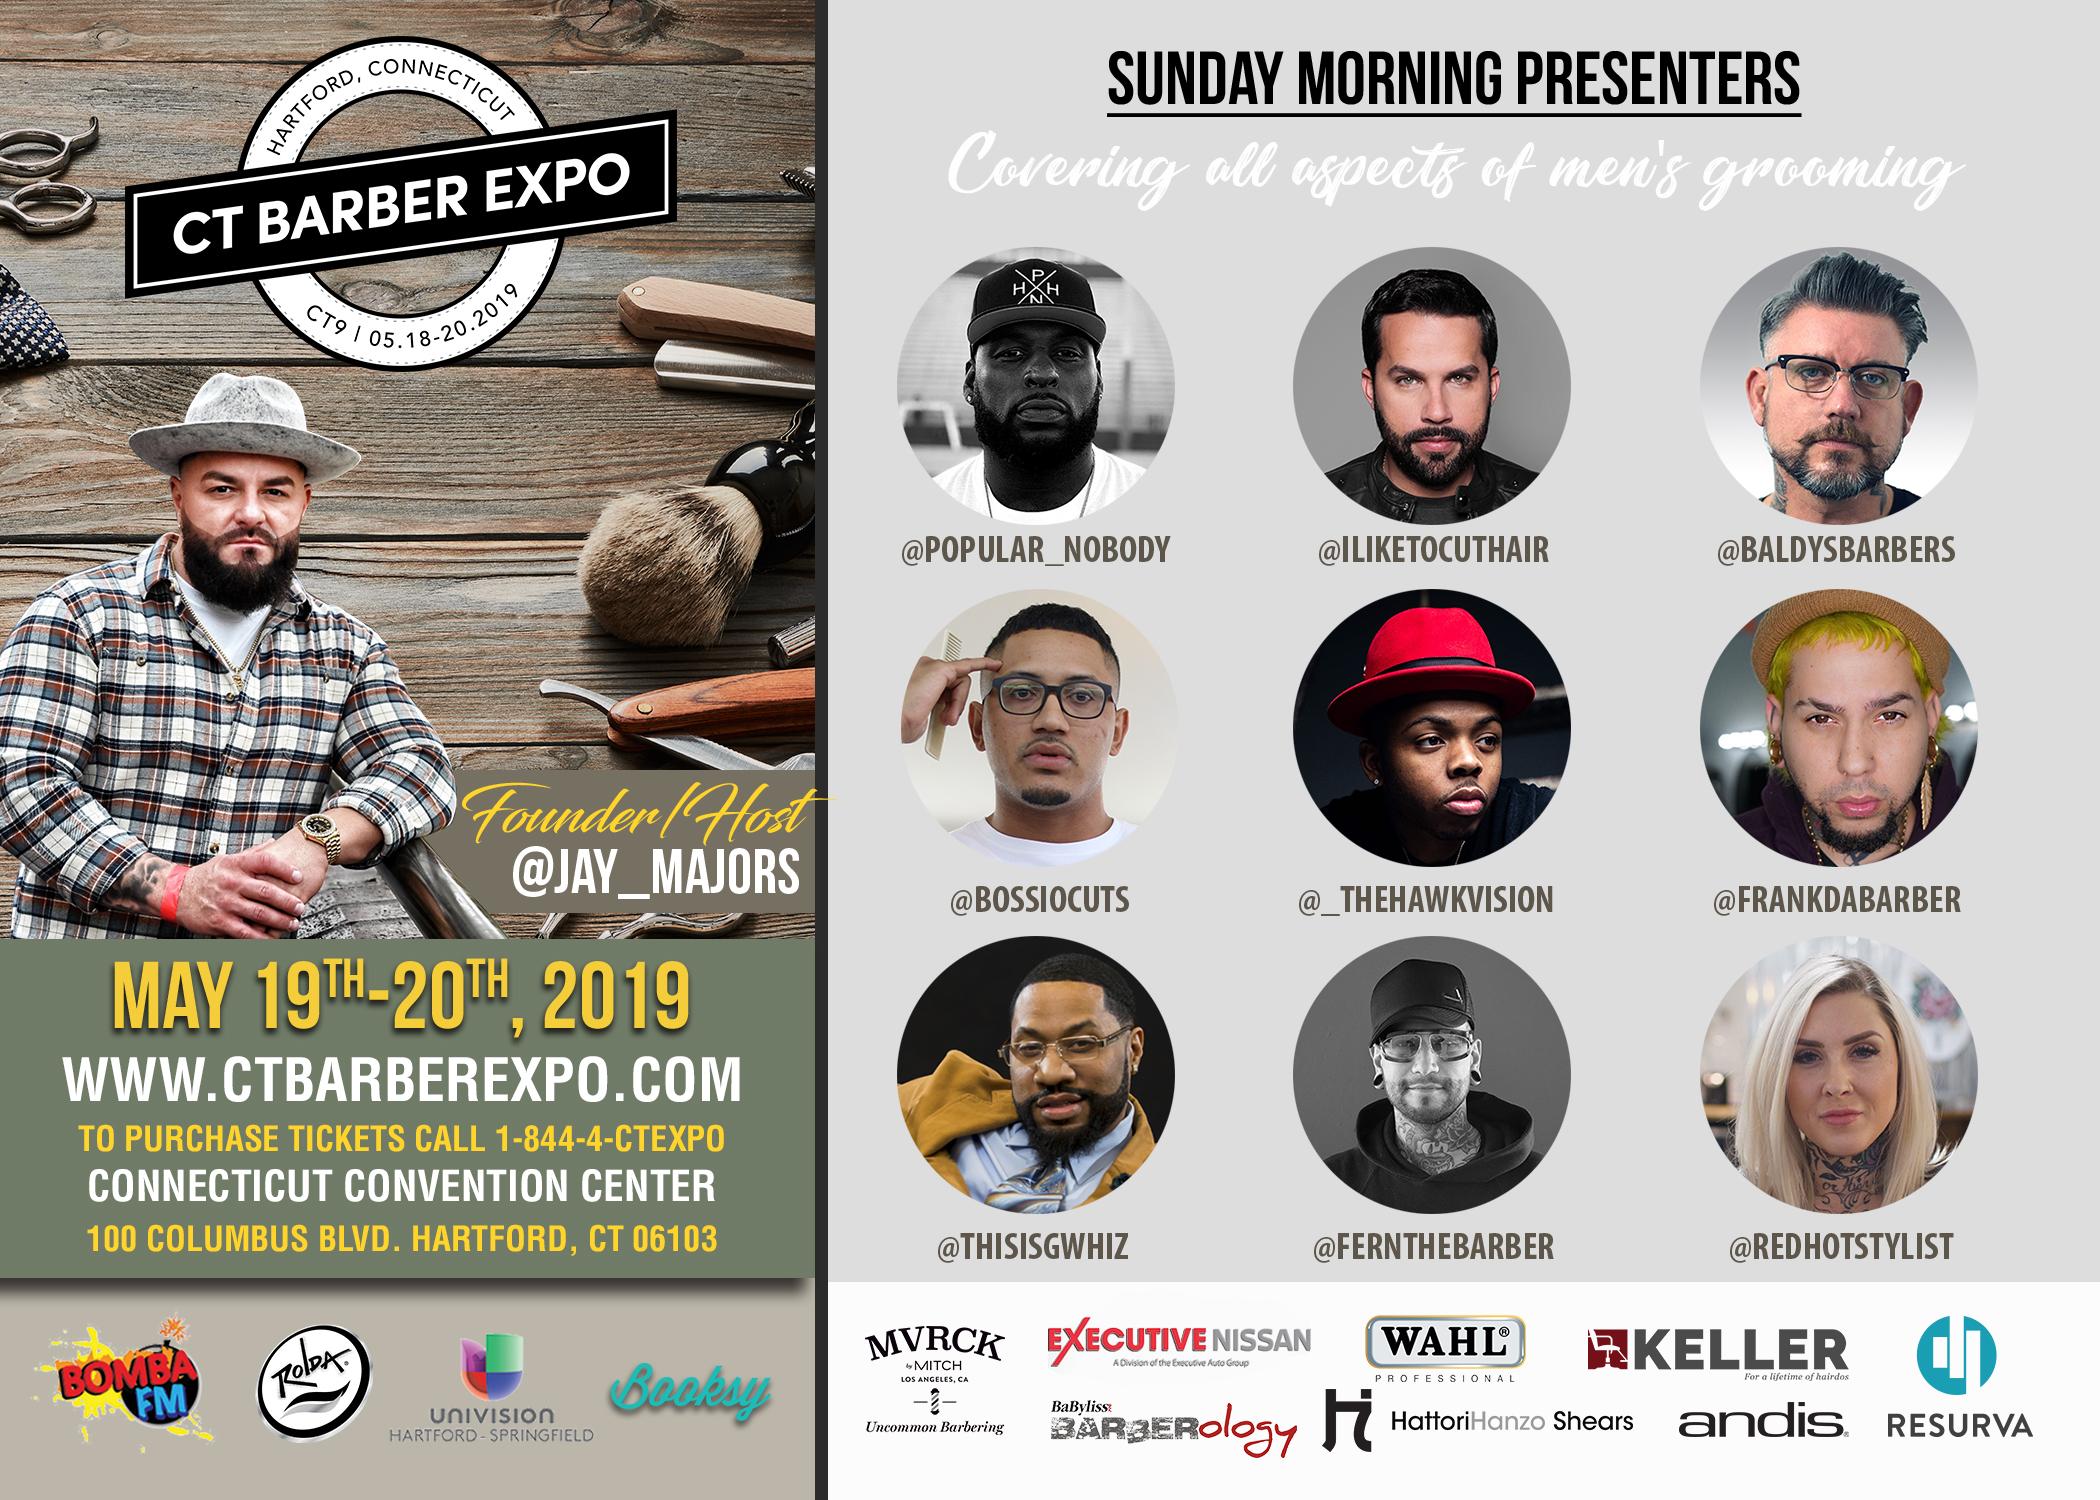 #BarberLove: CT Barber Expo May 18-20